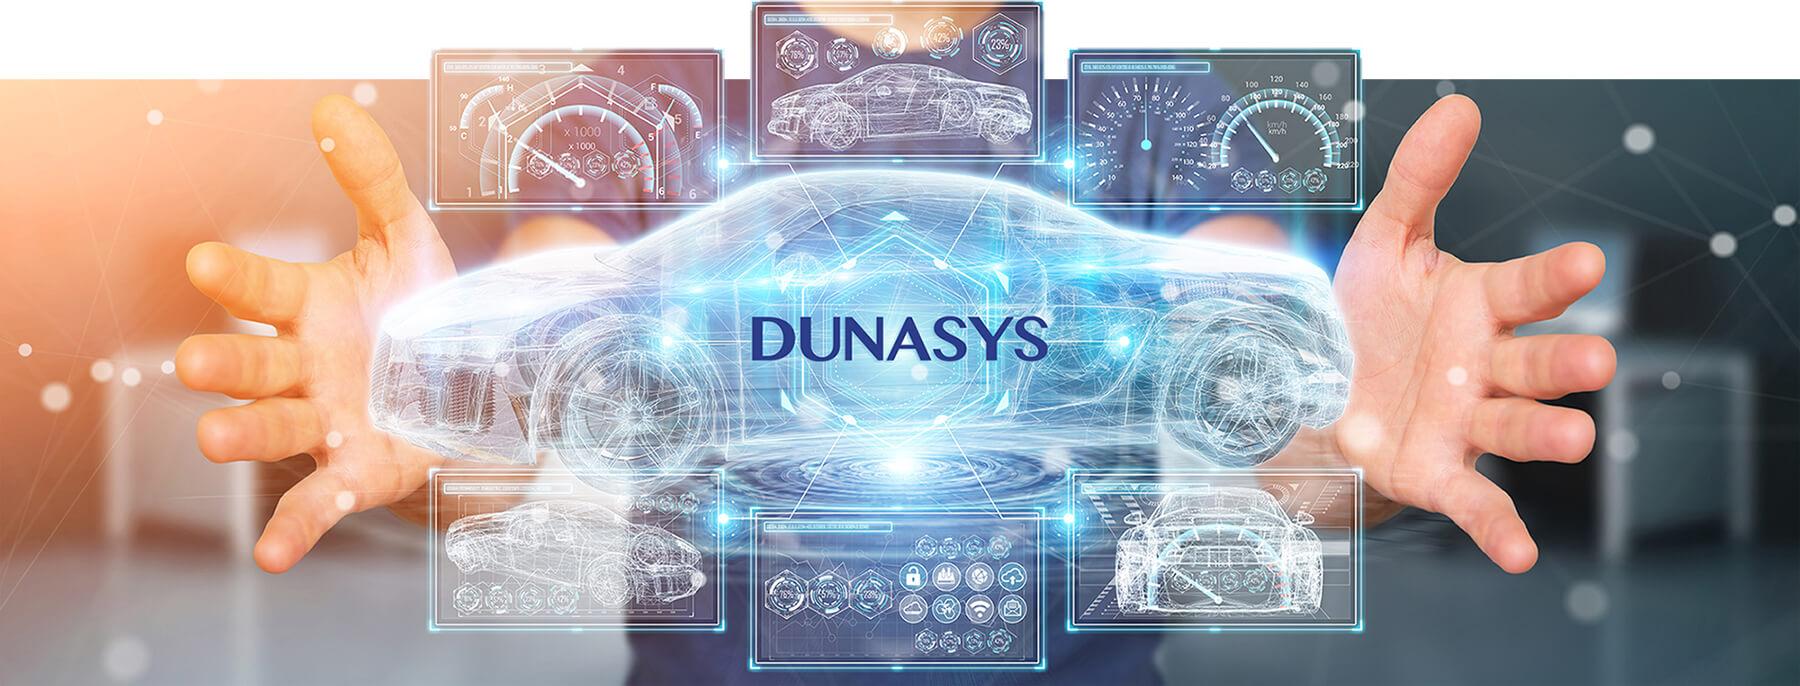 Dunasys